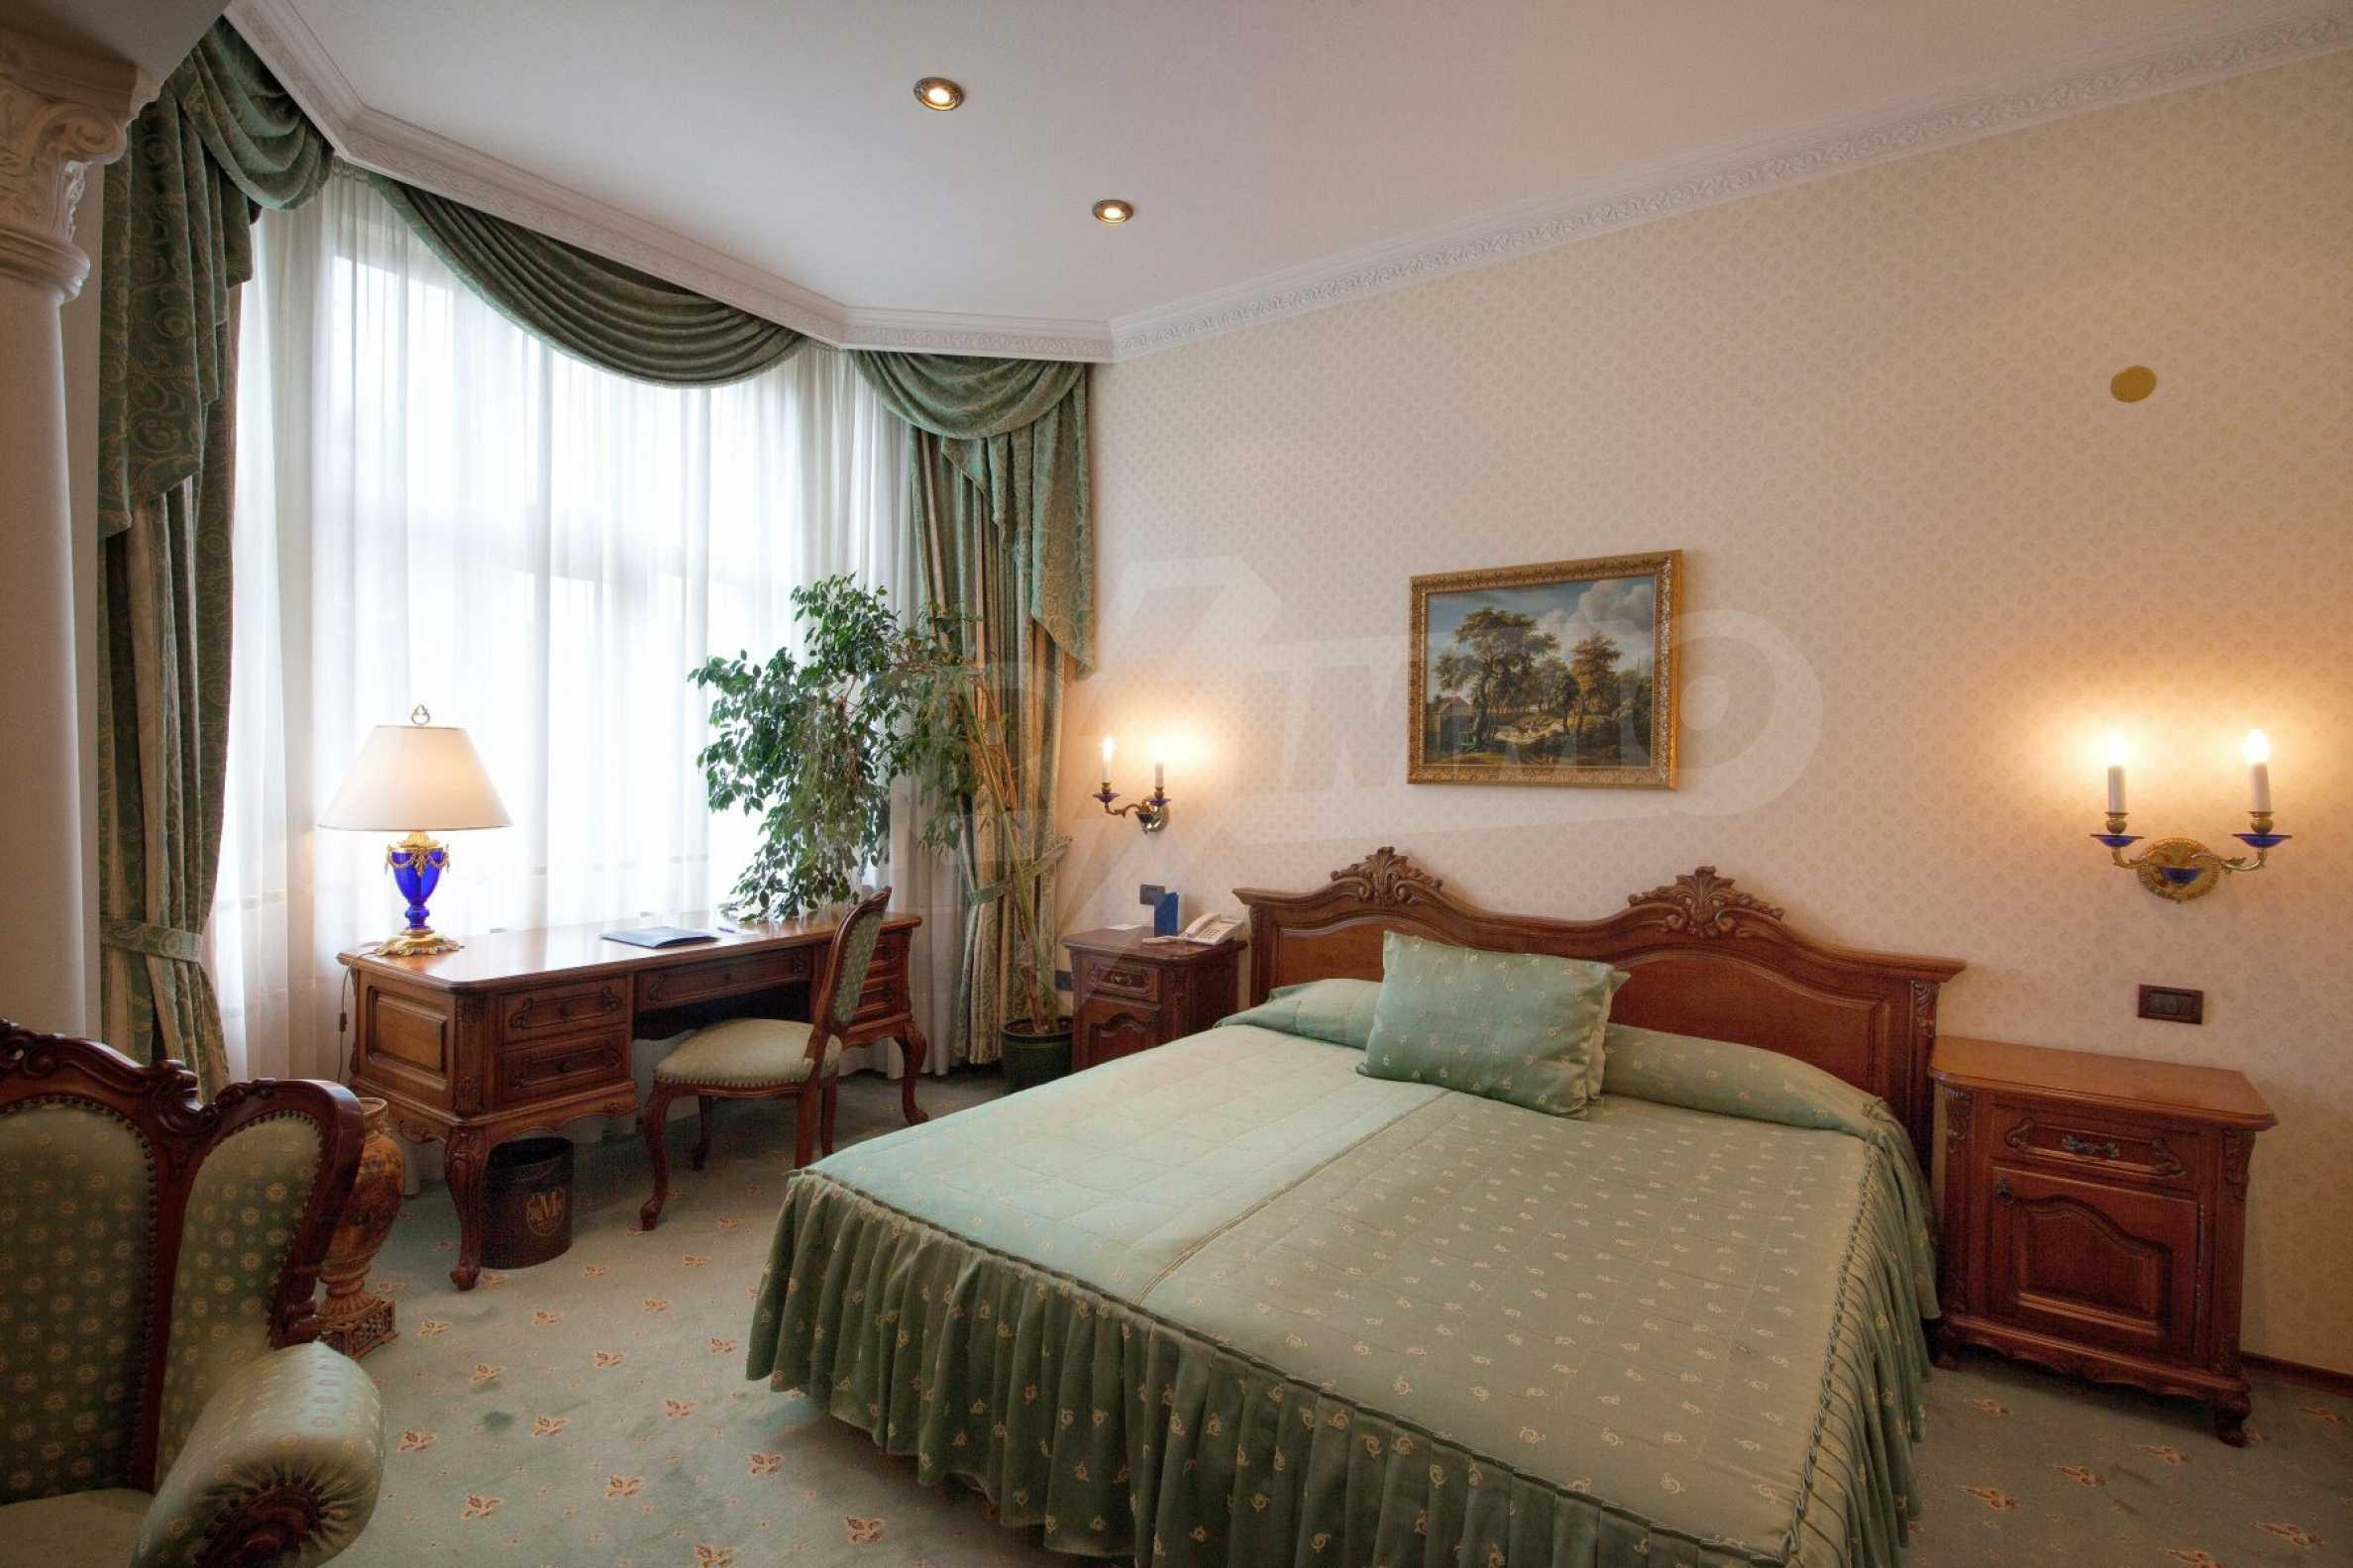 Fünf-Sterne-Hotel 9